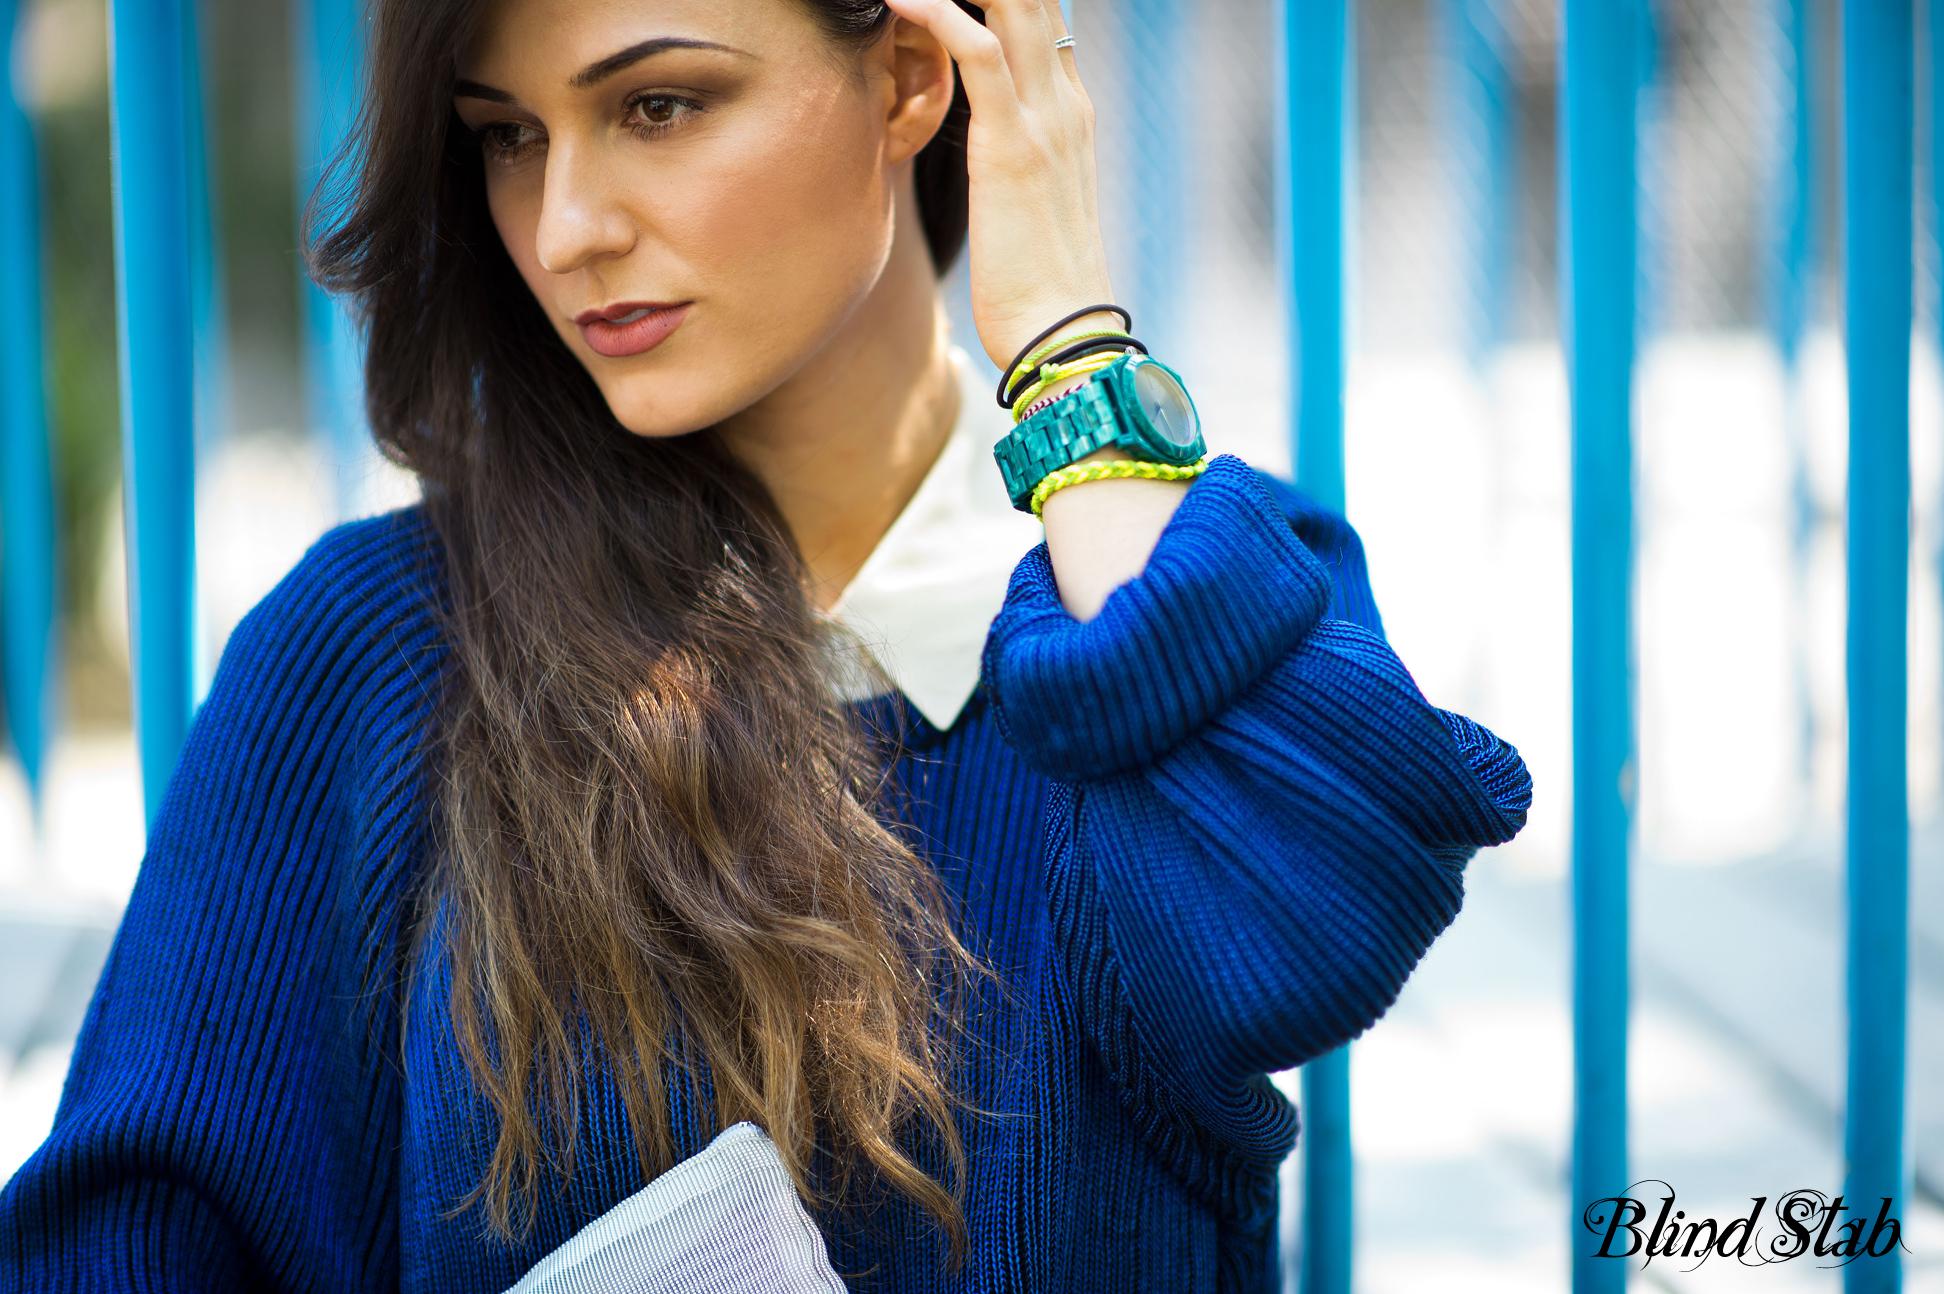 Streetstyle-Blue-Sweater-Nixon-Watch